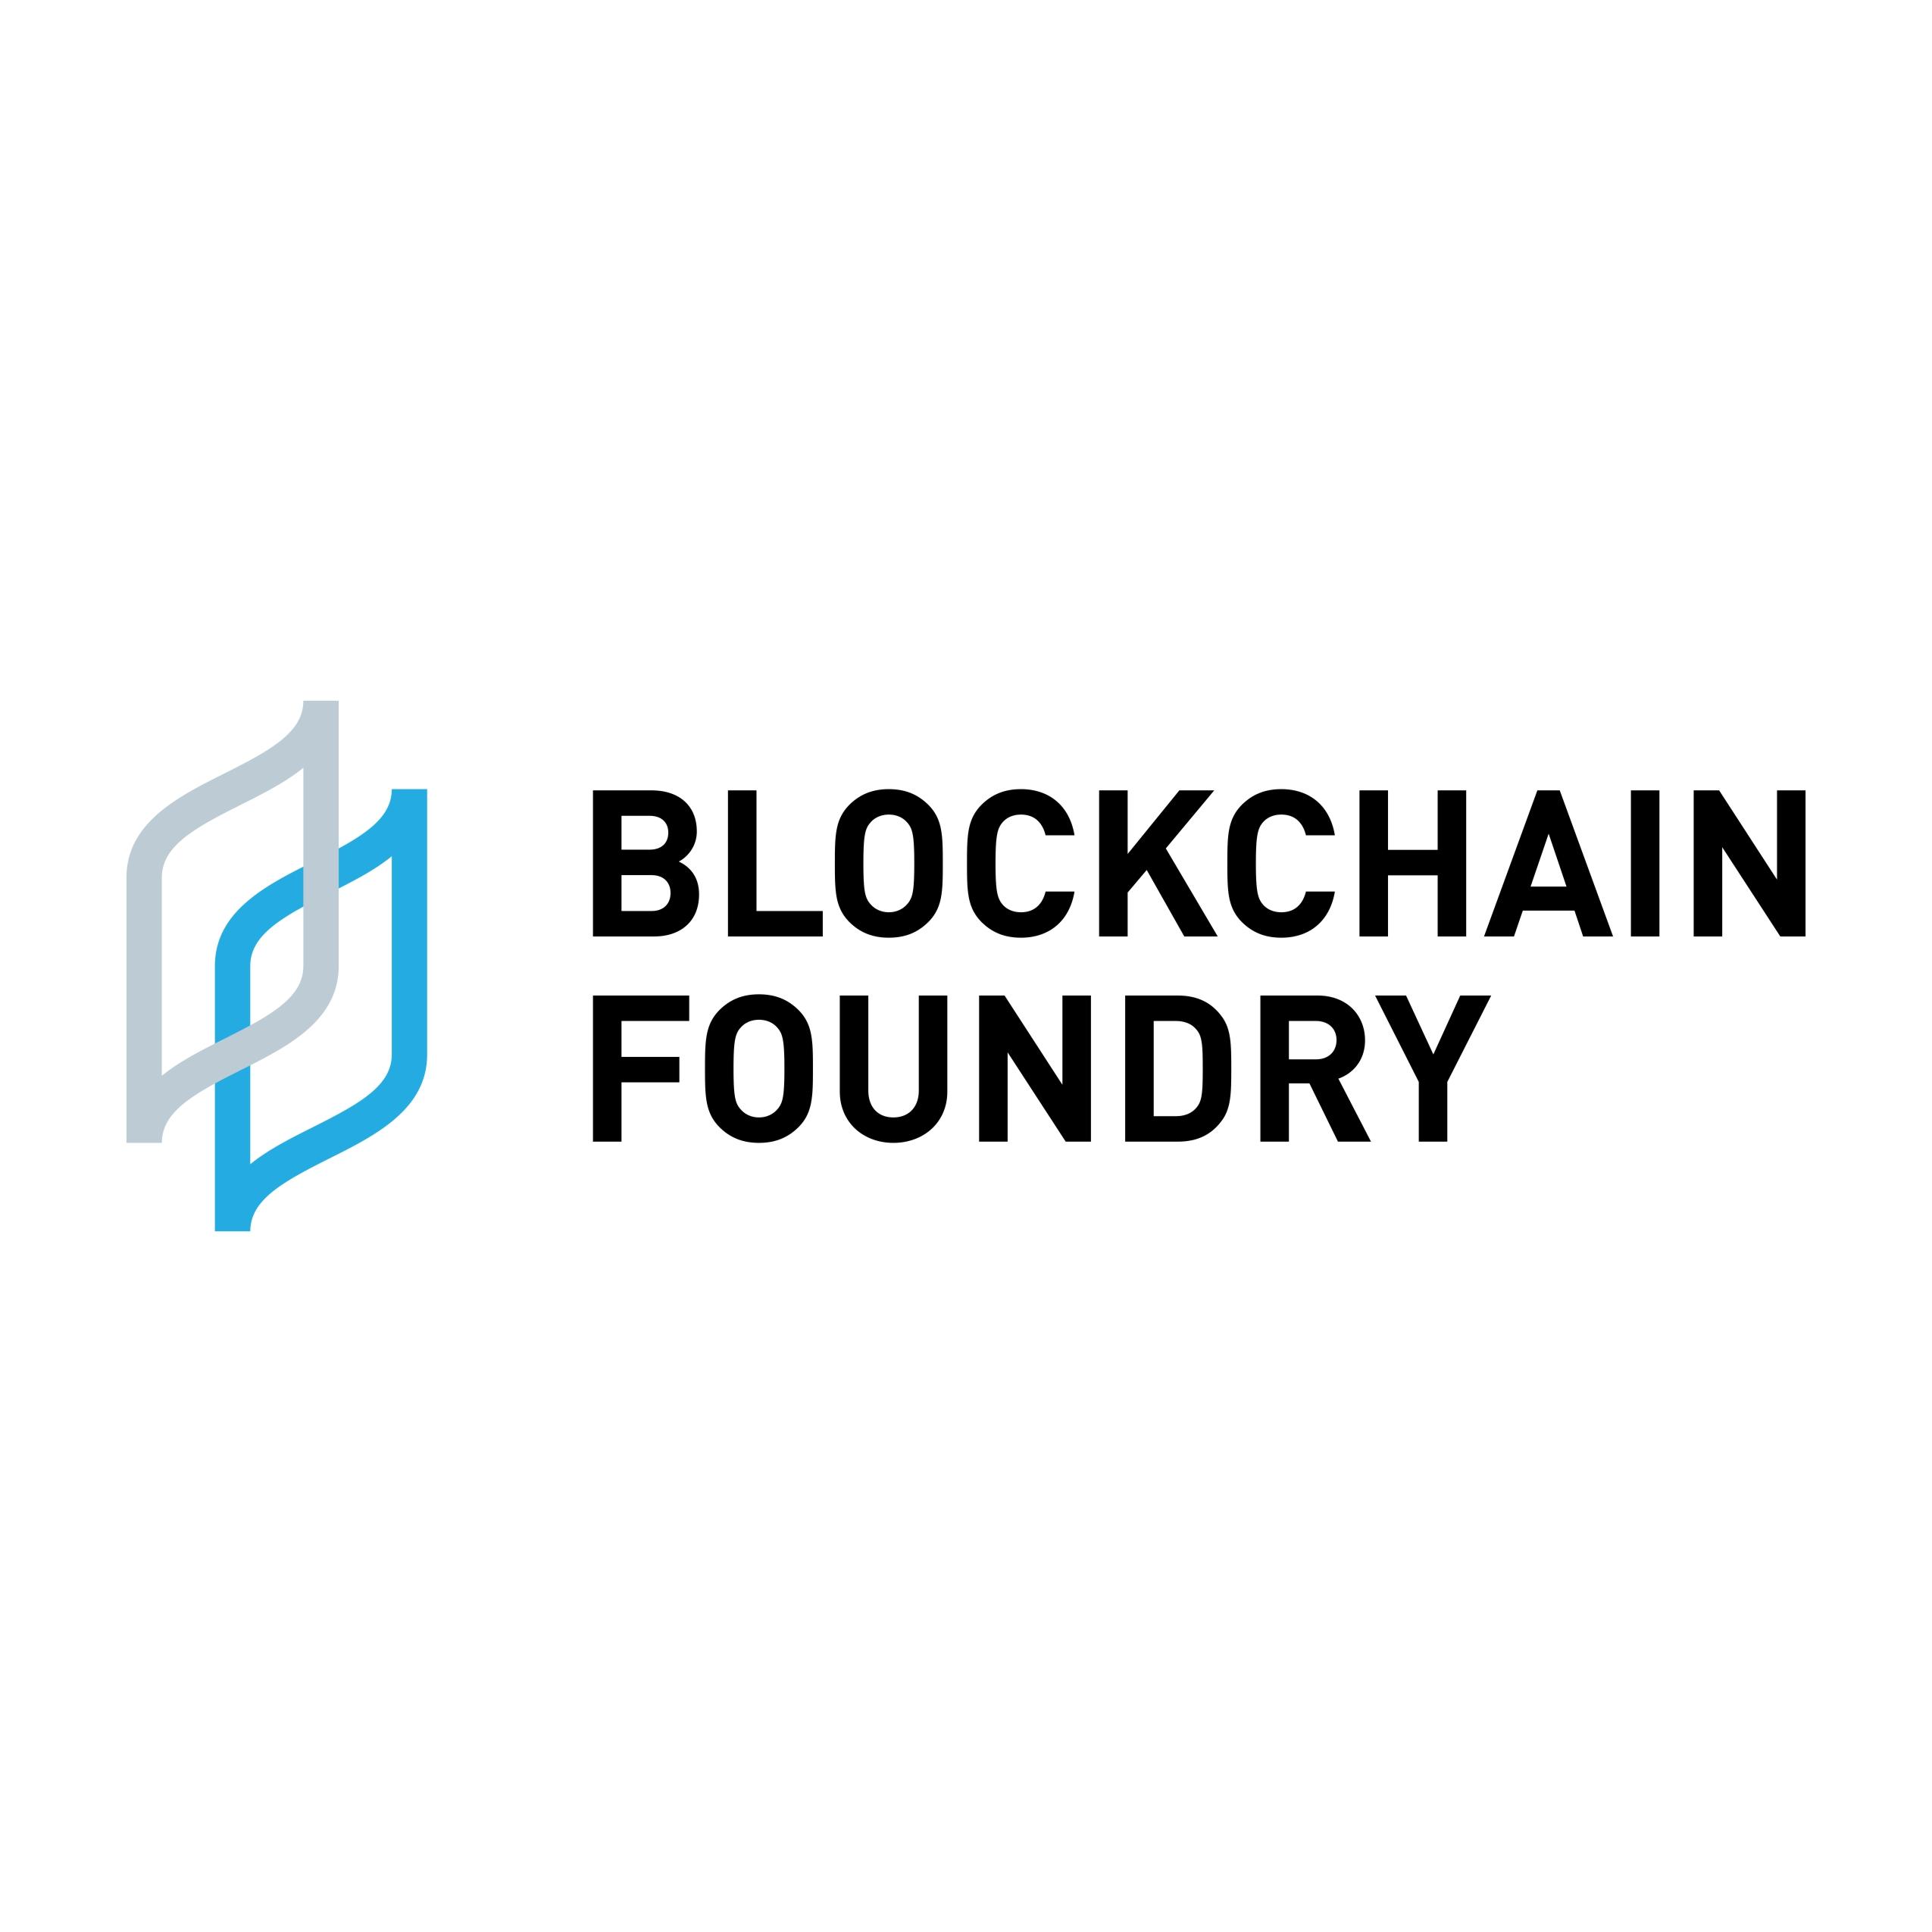 Blockchain Foundry Nominated as Blockchain Company of the Year